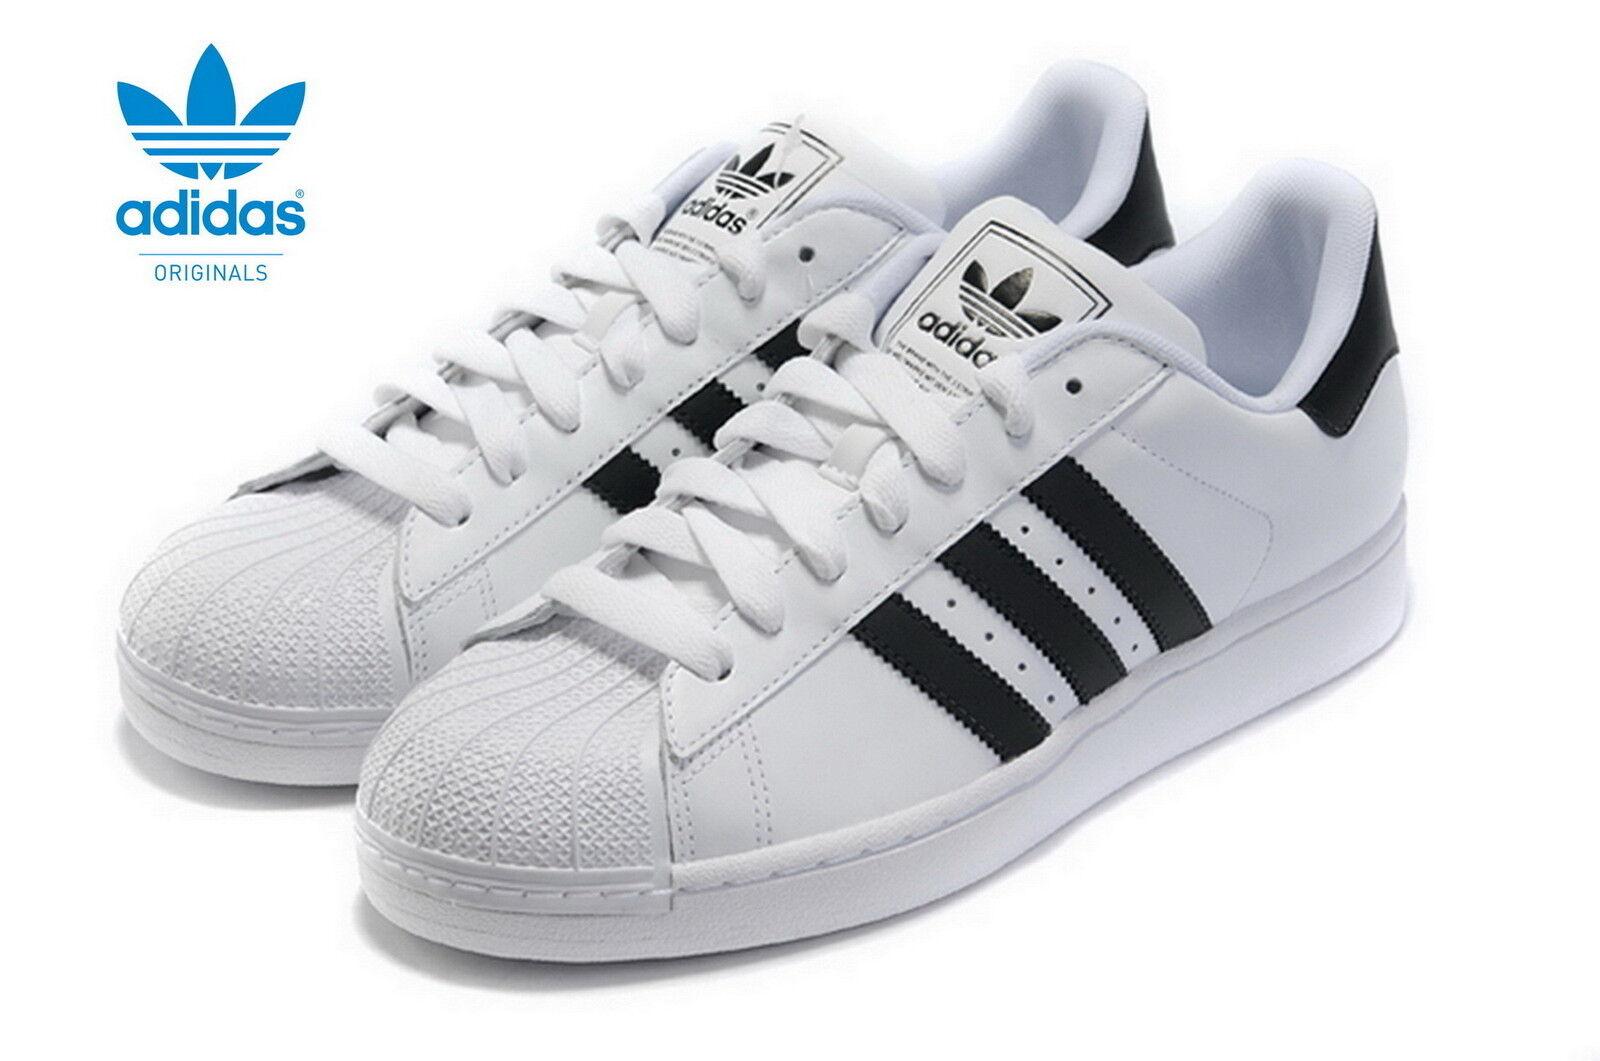 Adidas Superstar 2 Originals Turnschuhe Turnschuhe Turnschuhe Herren Turnschuhe G17068 weiss 9b2157